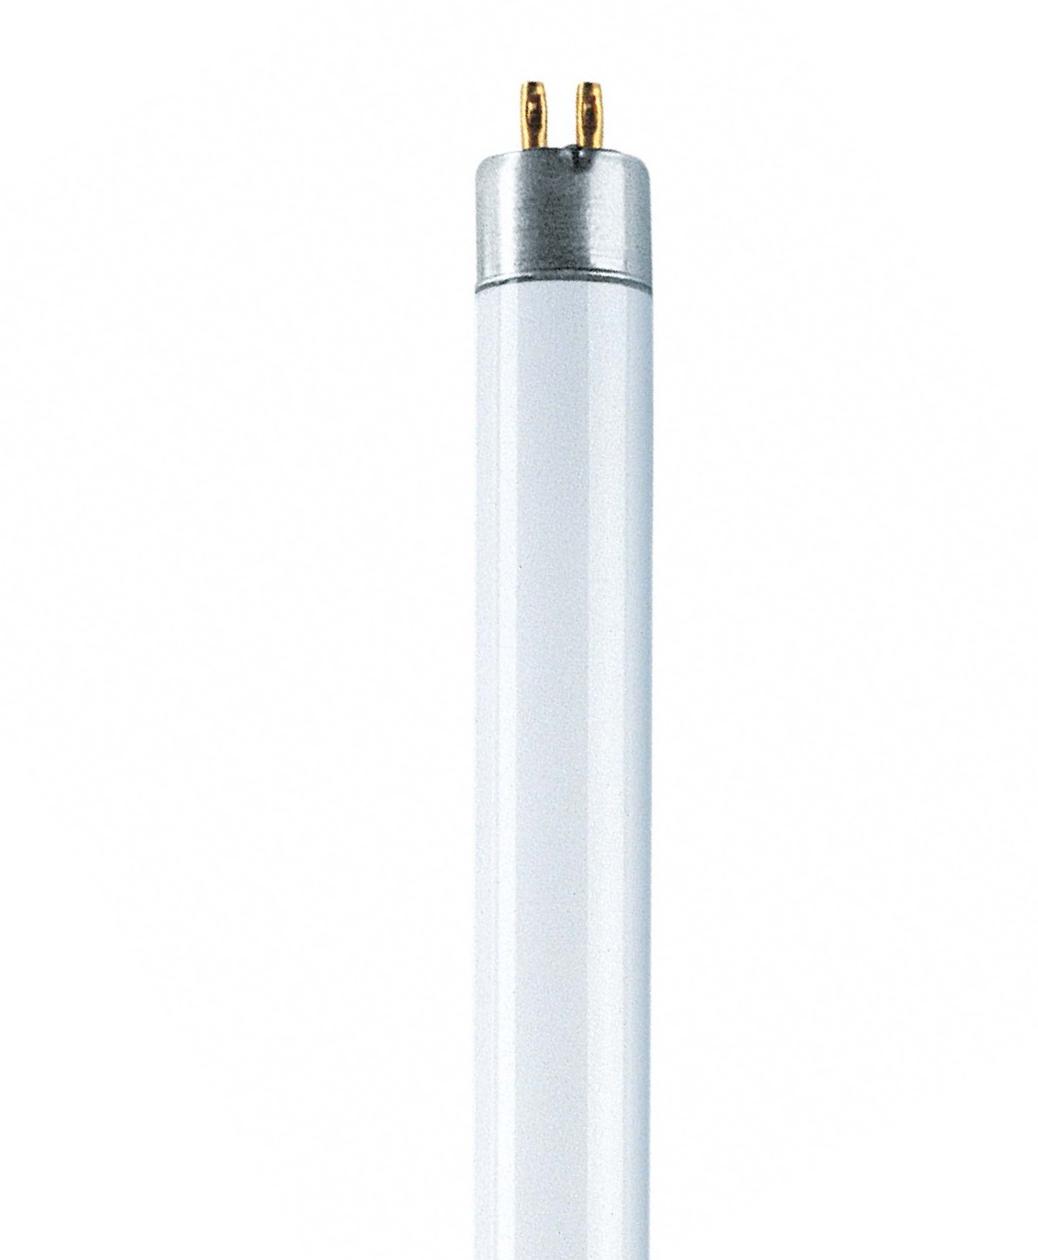 1 Stk T5 24W/830 G5 FLH1, Warmweiß, Leuchtstofflampe LI71240037